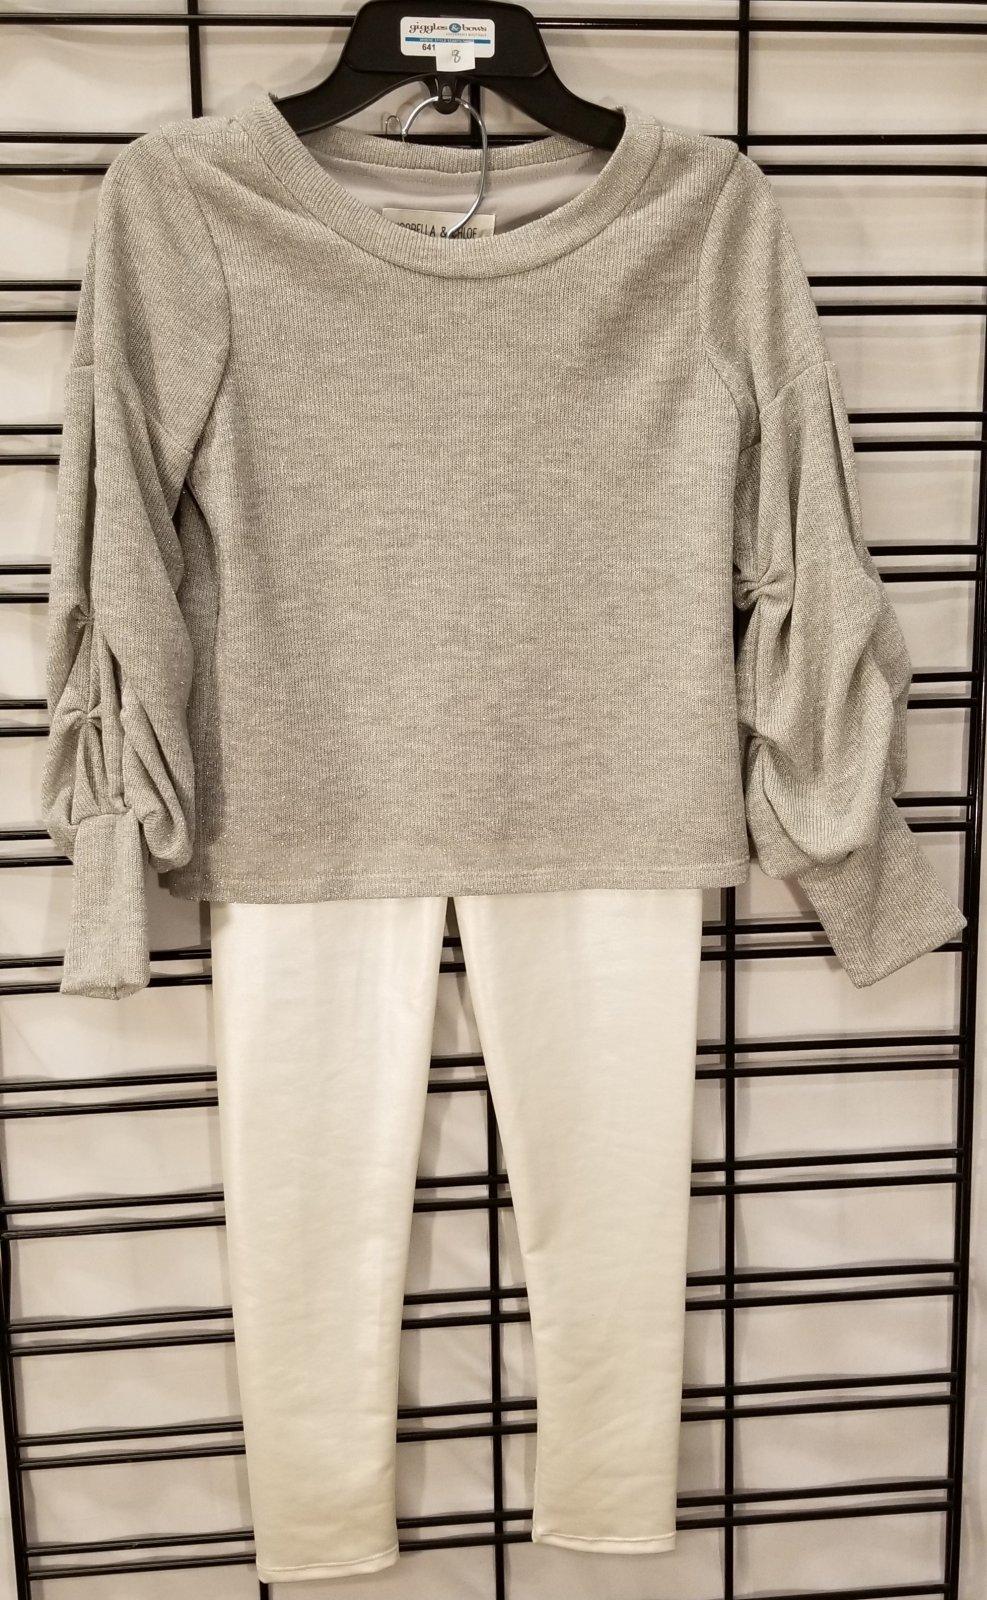 ISOBELLA & CHLOE - Silver Sparkle top/pants set